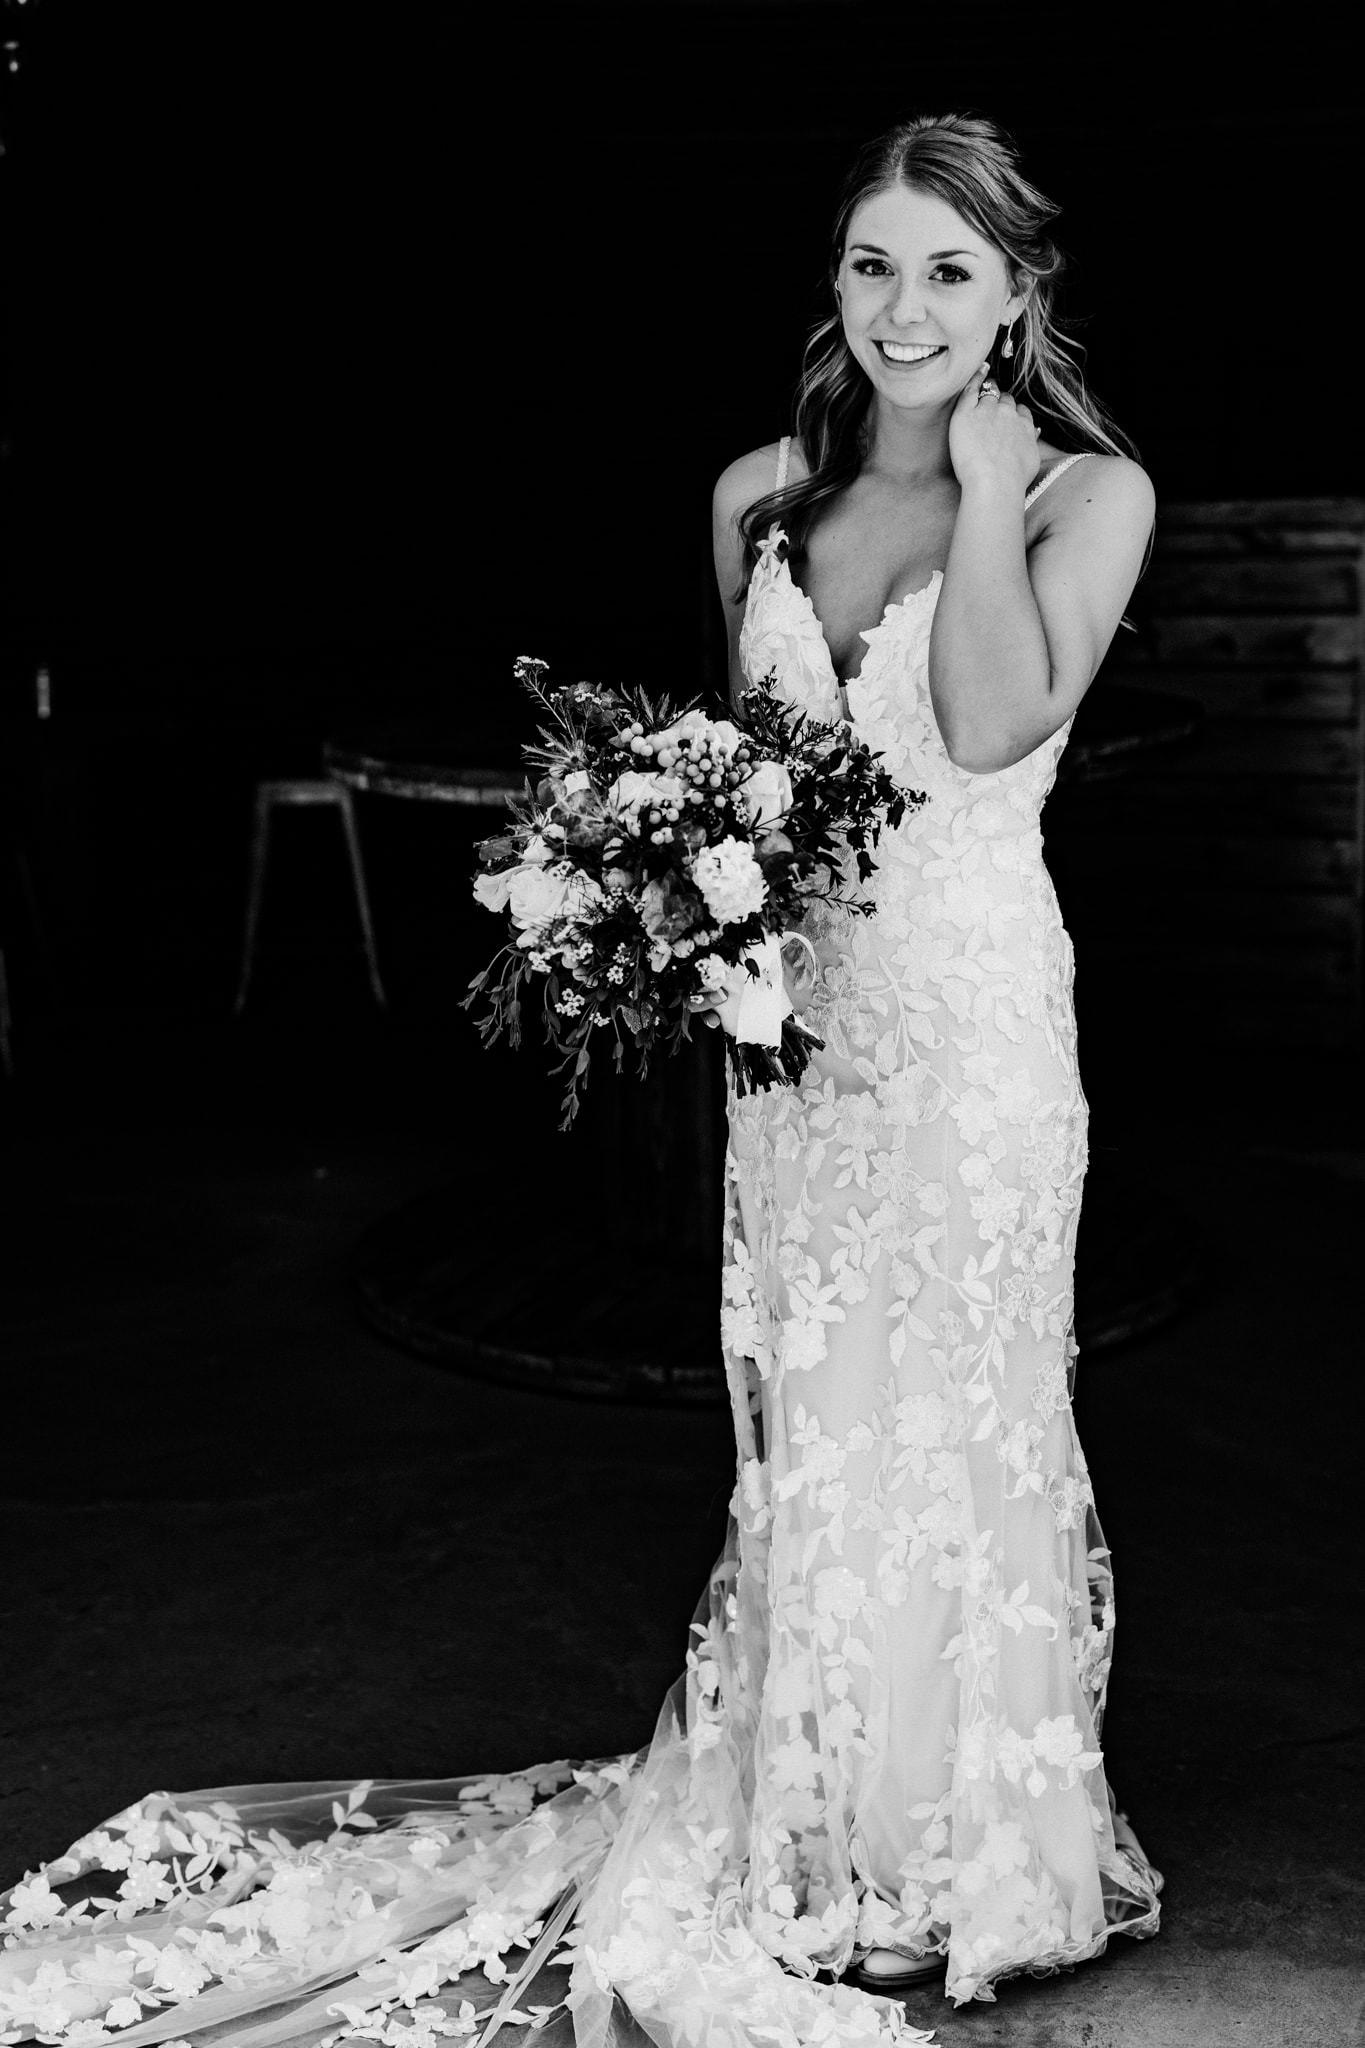 Bride smiles at the camera wit her bouquet during her Schroeder Farm Wedding